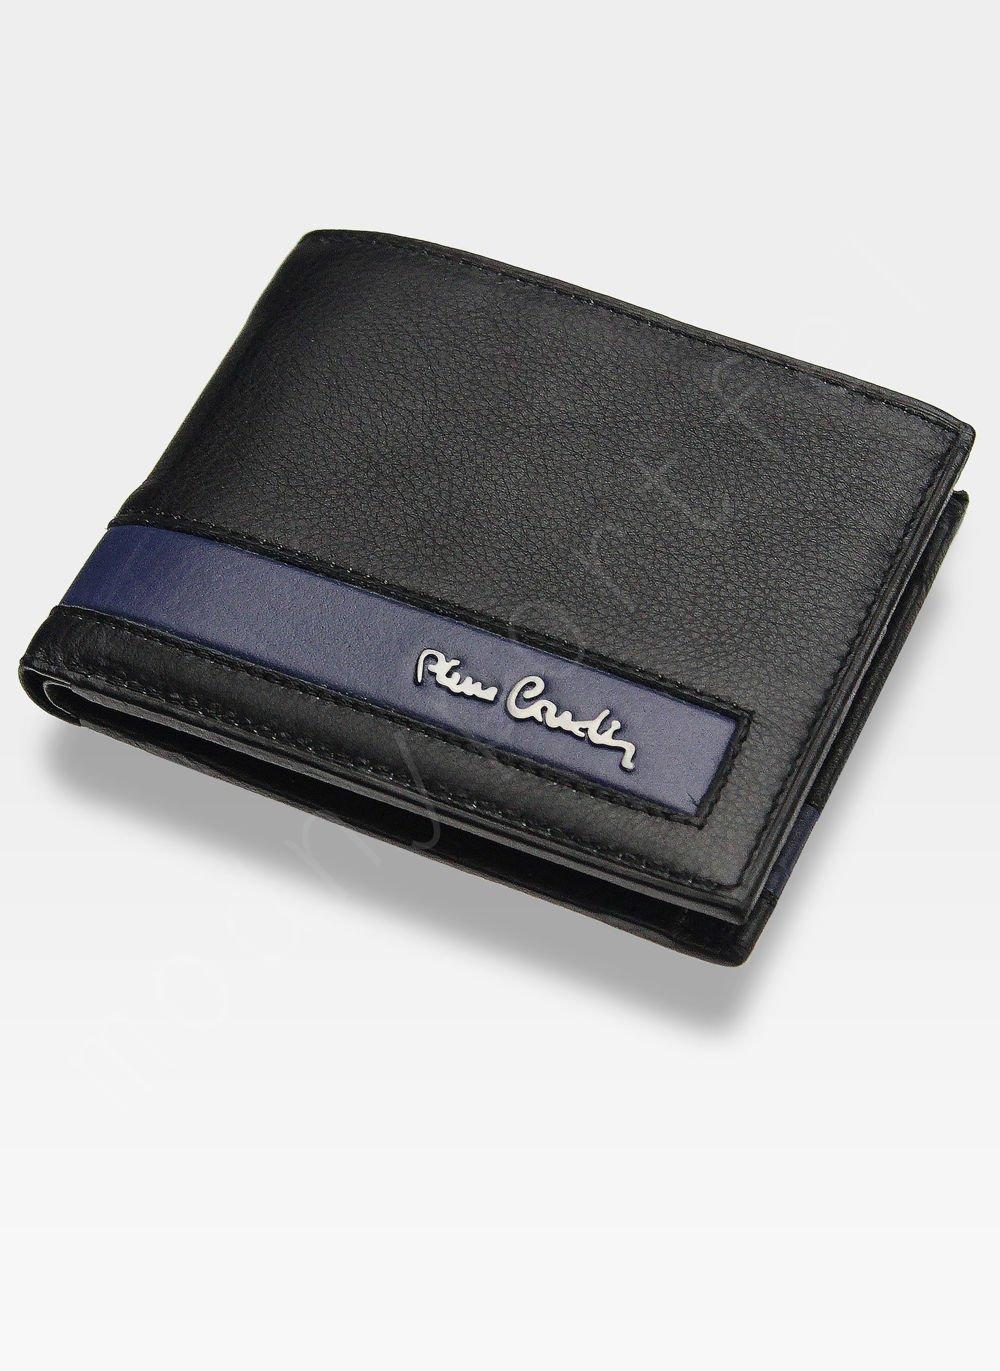 fce332b4fa3b0 Męski portfel prawdziwa skóra Blue Mirror Pierre Cardin Tilak26 8824 ...